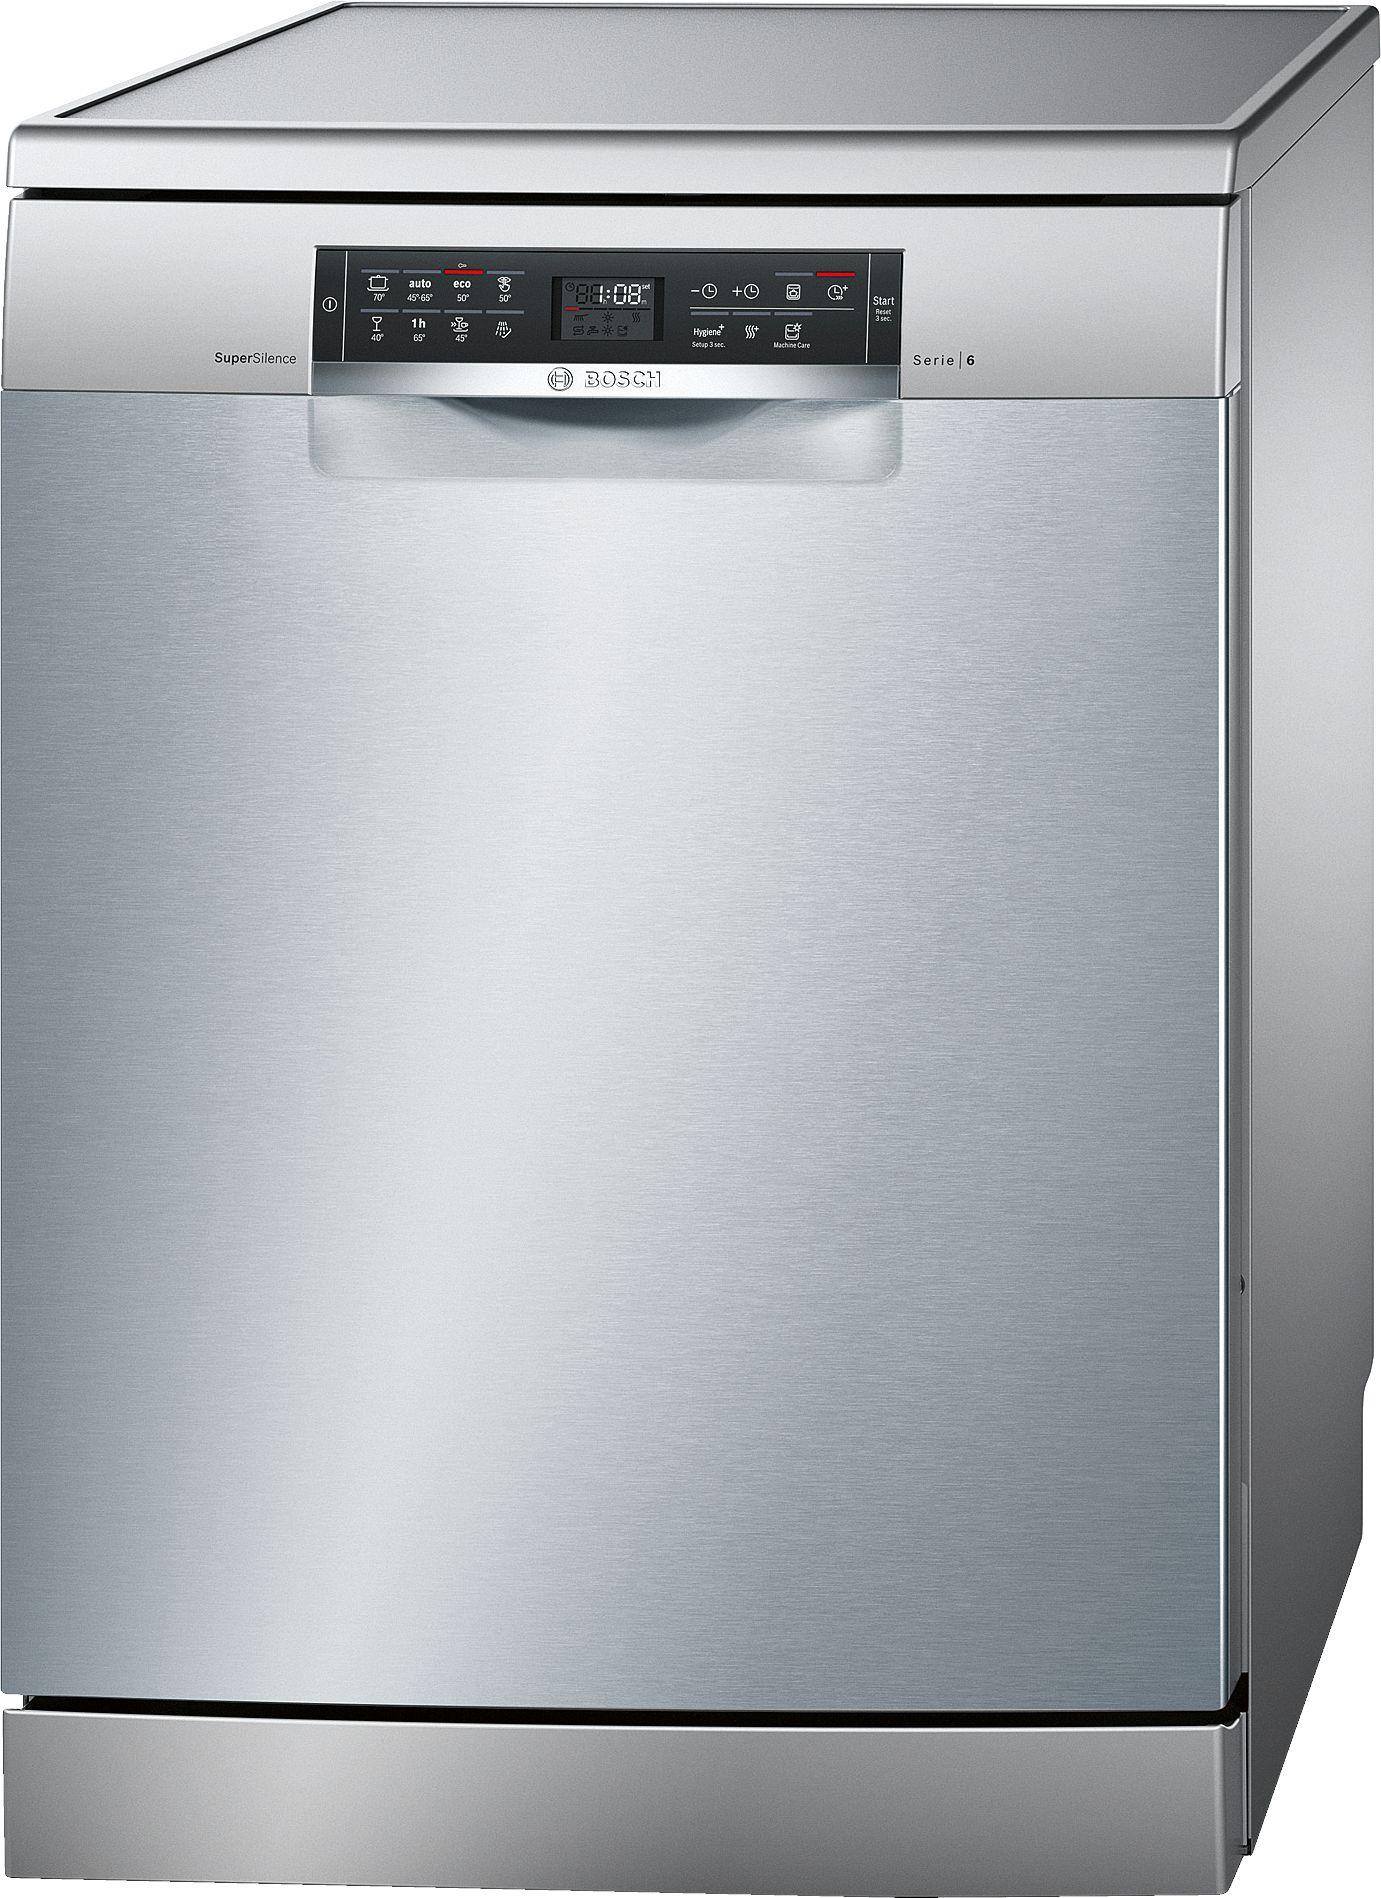 Serie | 6 SuperSilence mašina za pranje sudova, 60 cm samostalna mašina za pranje sudova, Silver inox